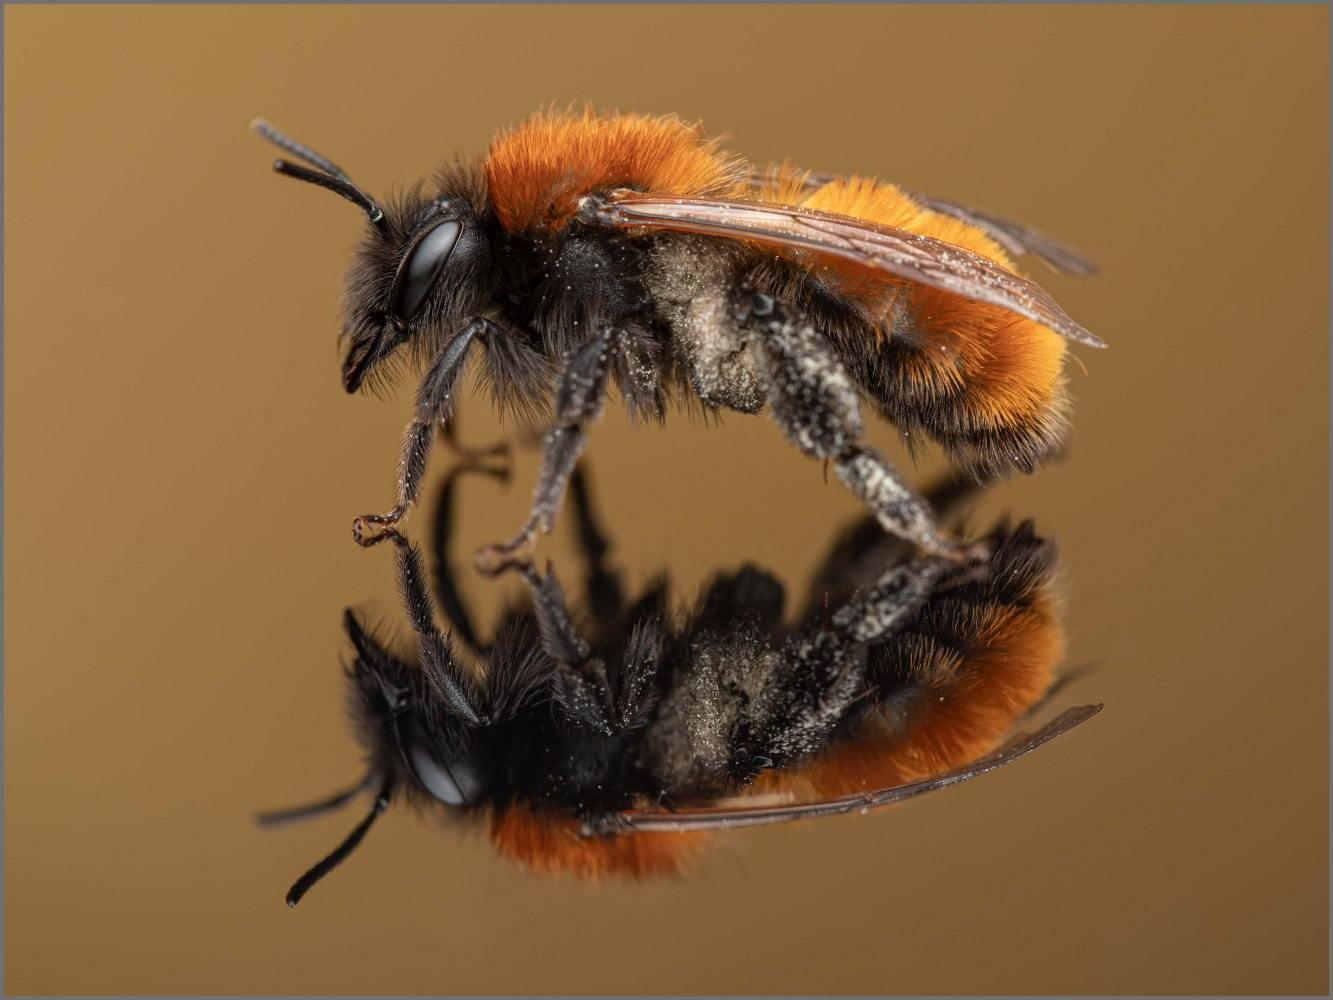 Andrena-fulva-female-Muller-1766-4